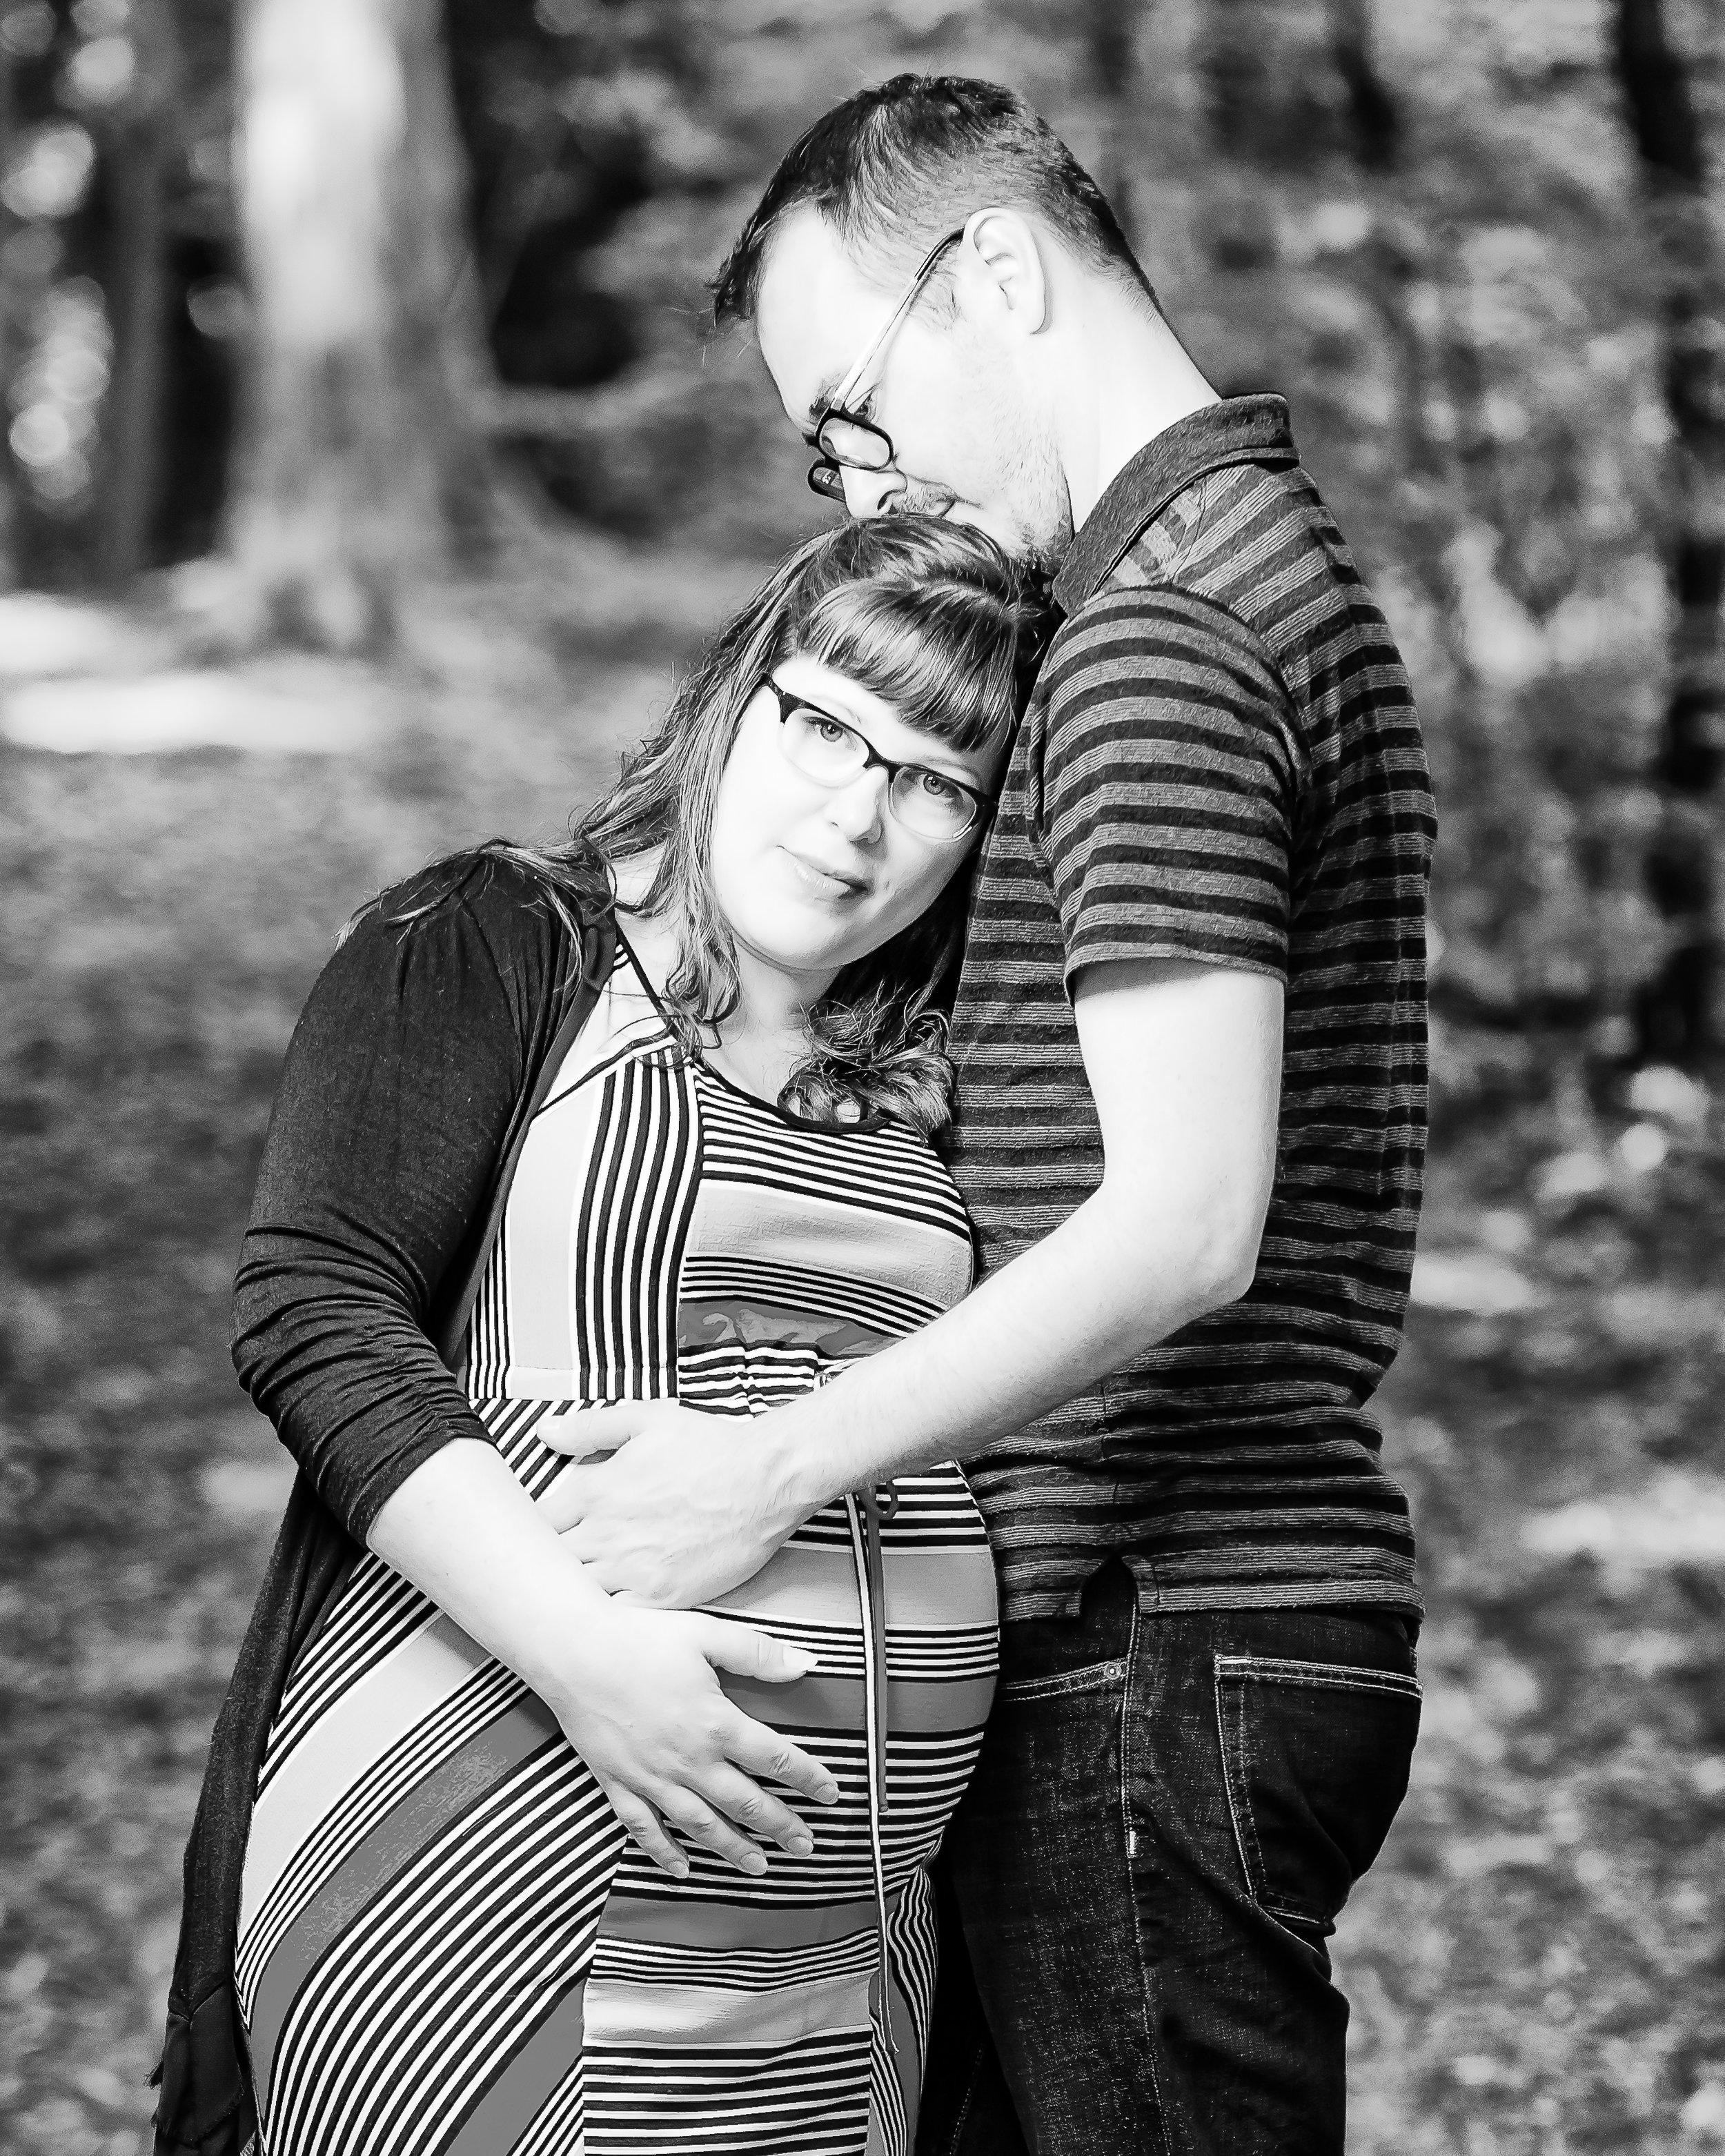 2018_June_23-06_23_2018_Ben_Anna_Maternity-48847-Edit-2-2.jpg